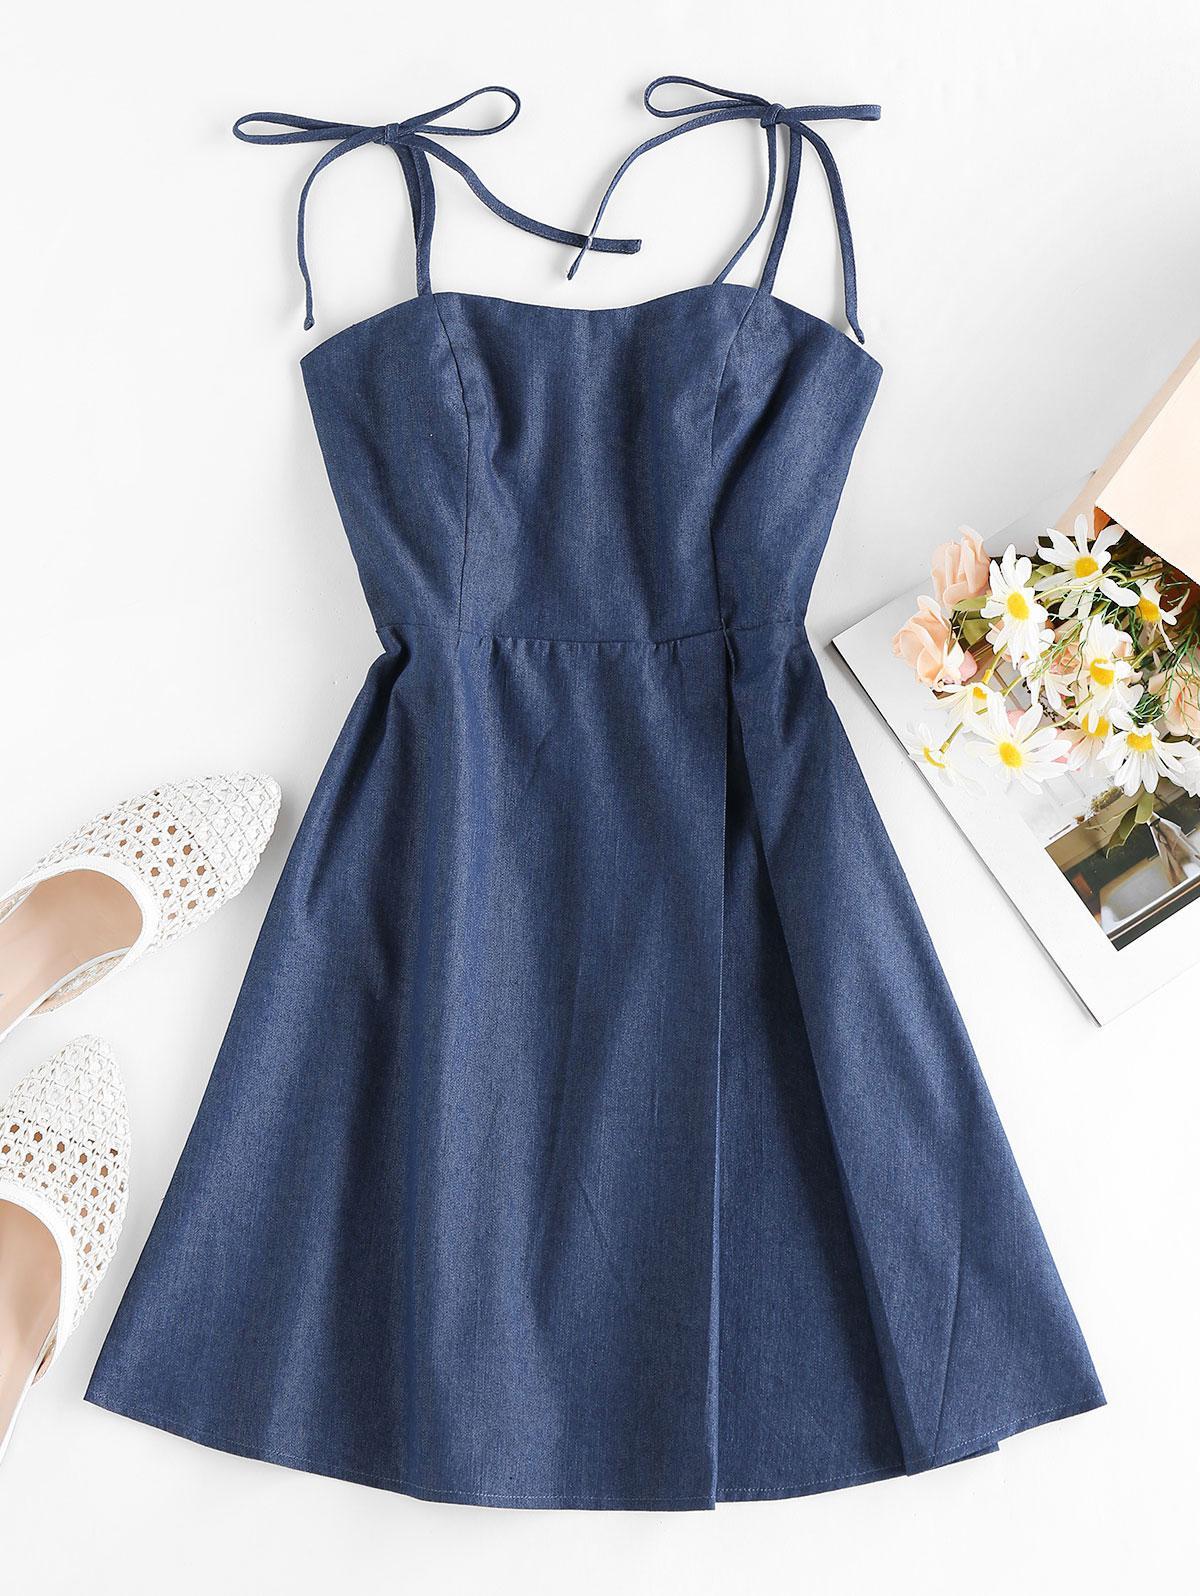 ZAFUL Tie Smocked Chambray Dress